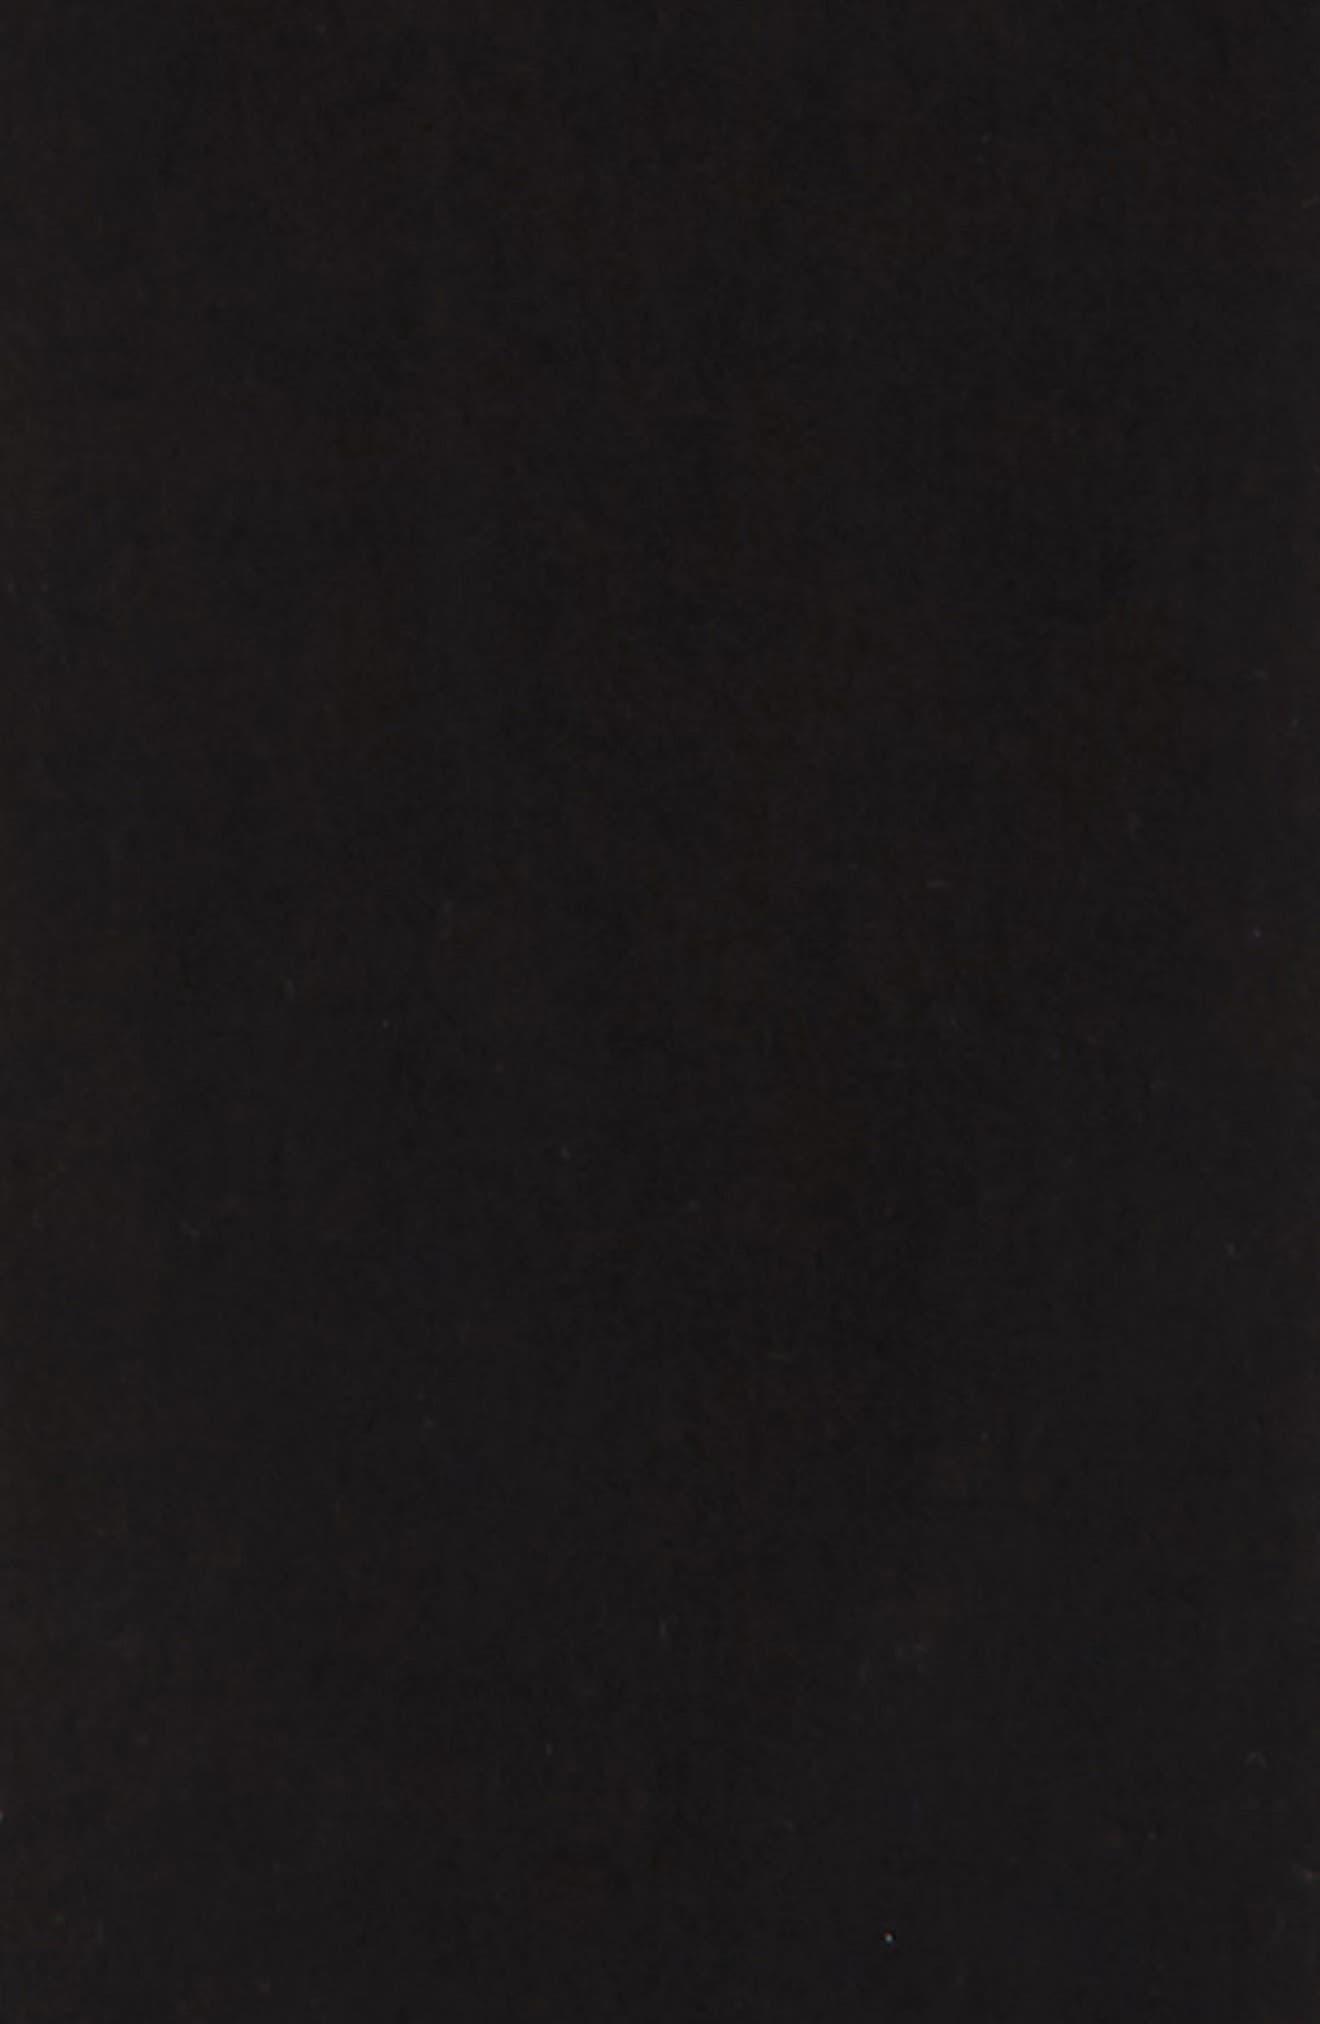 Slim Fit Stretch Chinos,                             Alternate thumbnail 3, color,                             BLACK